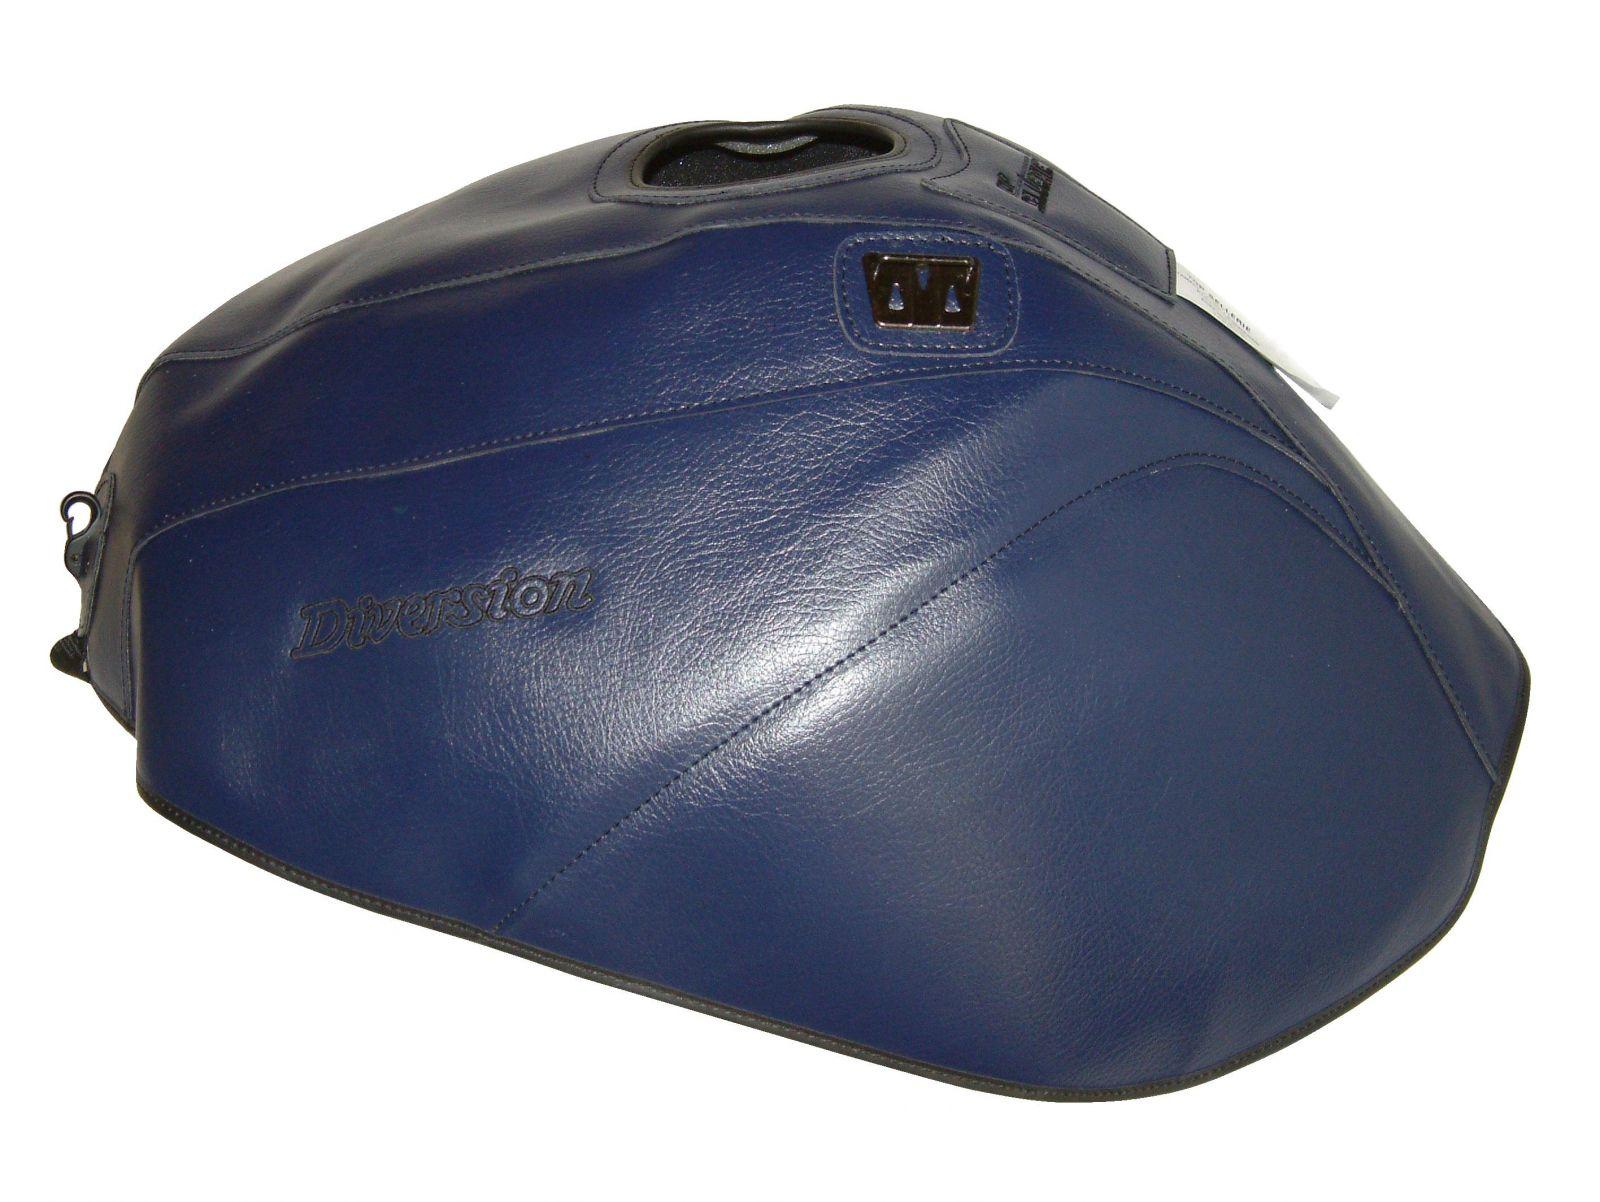 Cubre depósito TPR2002 - YAMAHA DIVERSION XJ 900 [1995-2003]